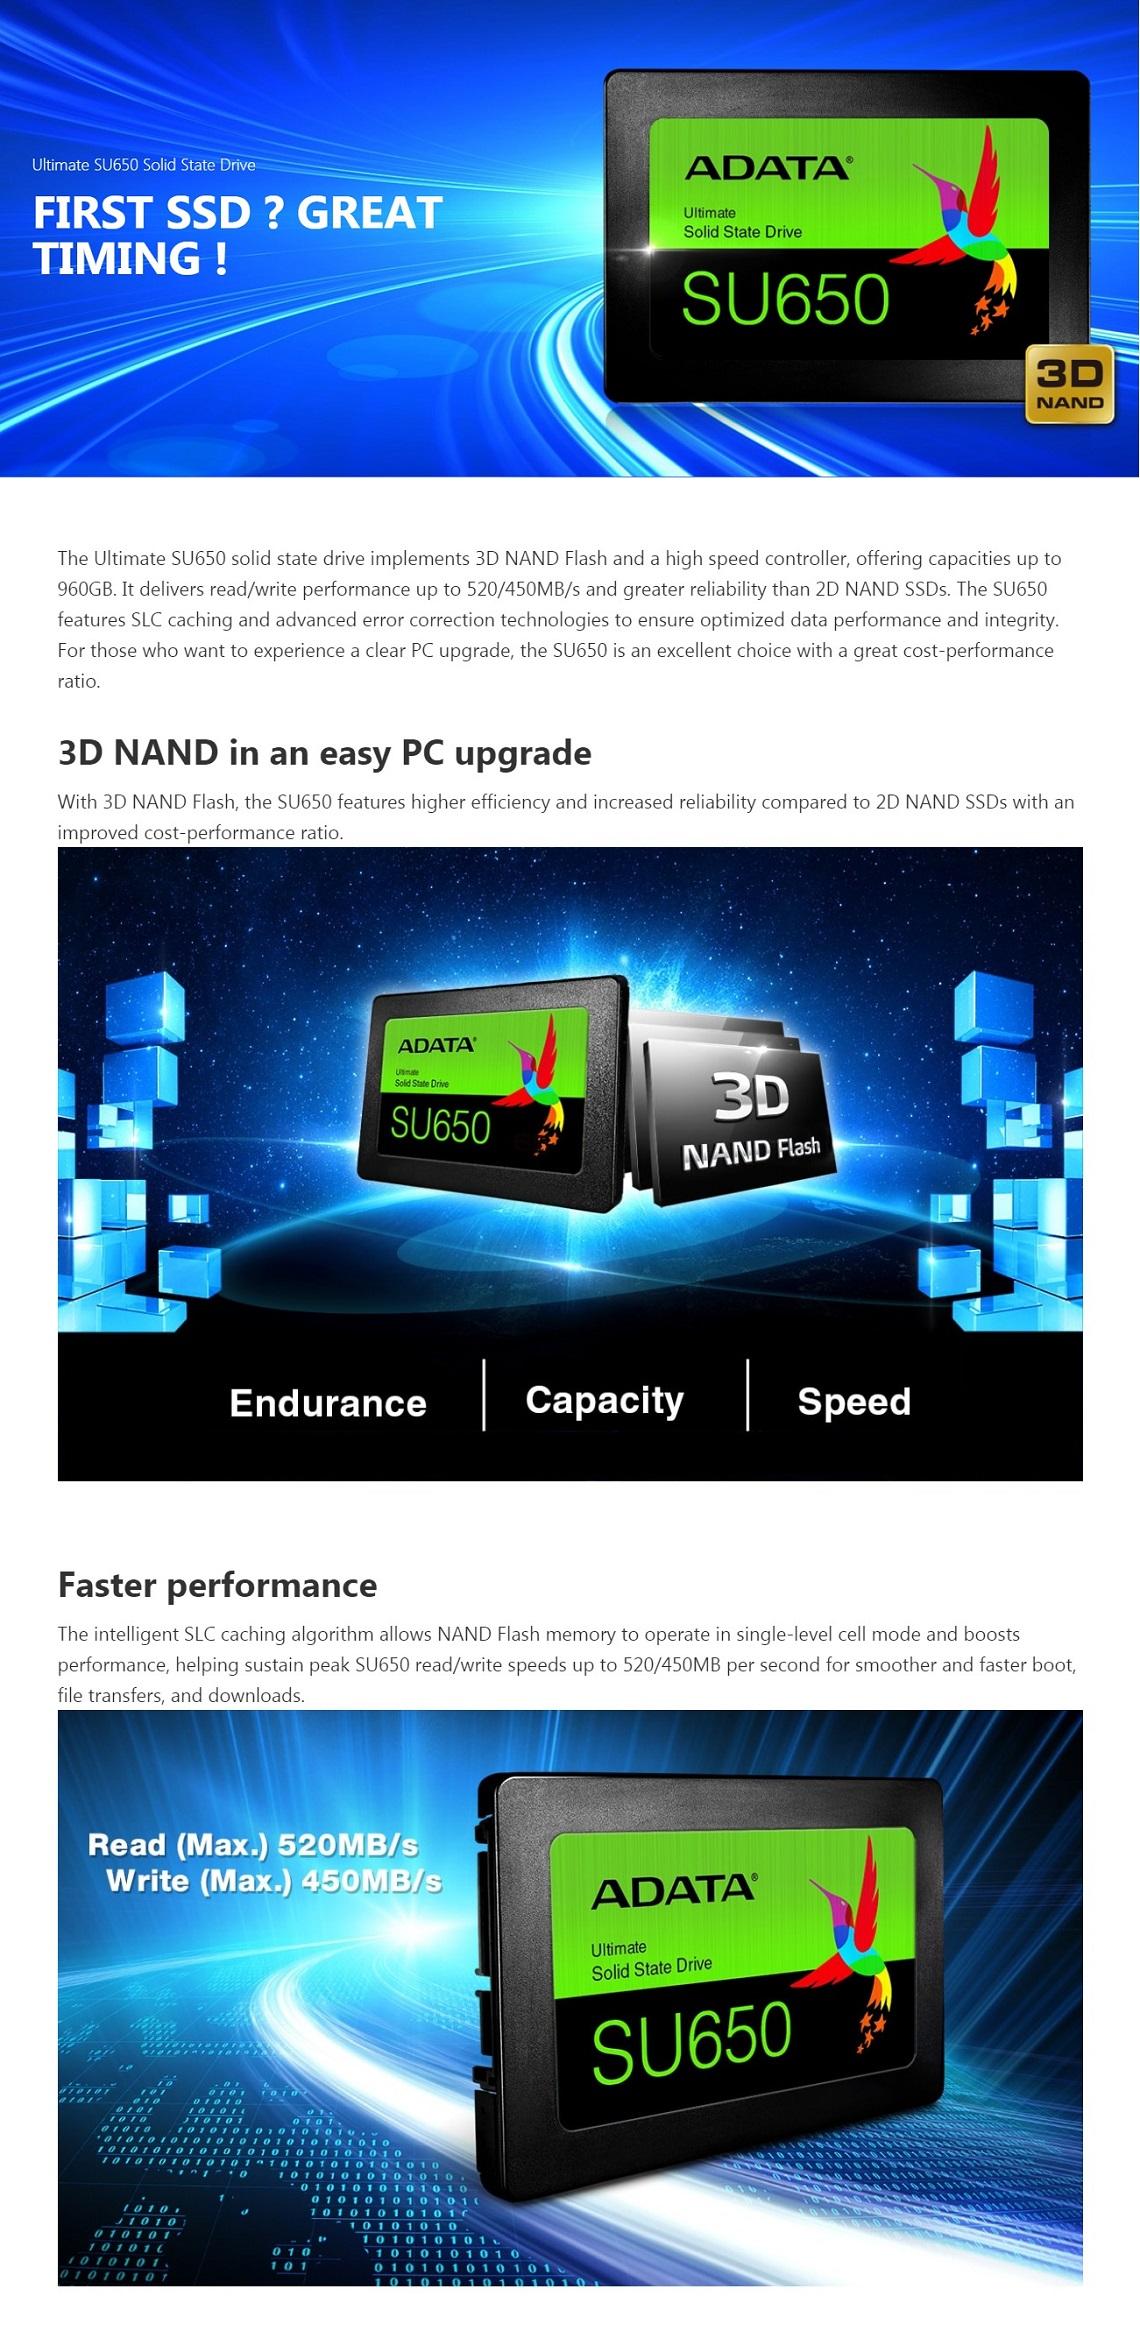 Adata 480GB Ultimate SU650 Solid State Drive 3D NAND Flash SATA3 6Gb/s 2.5